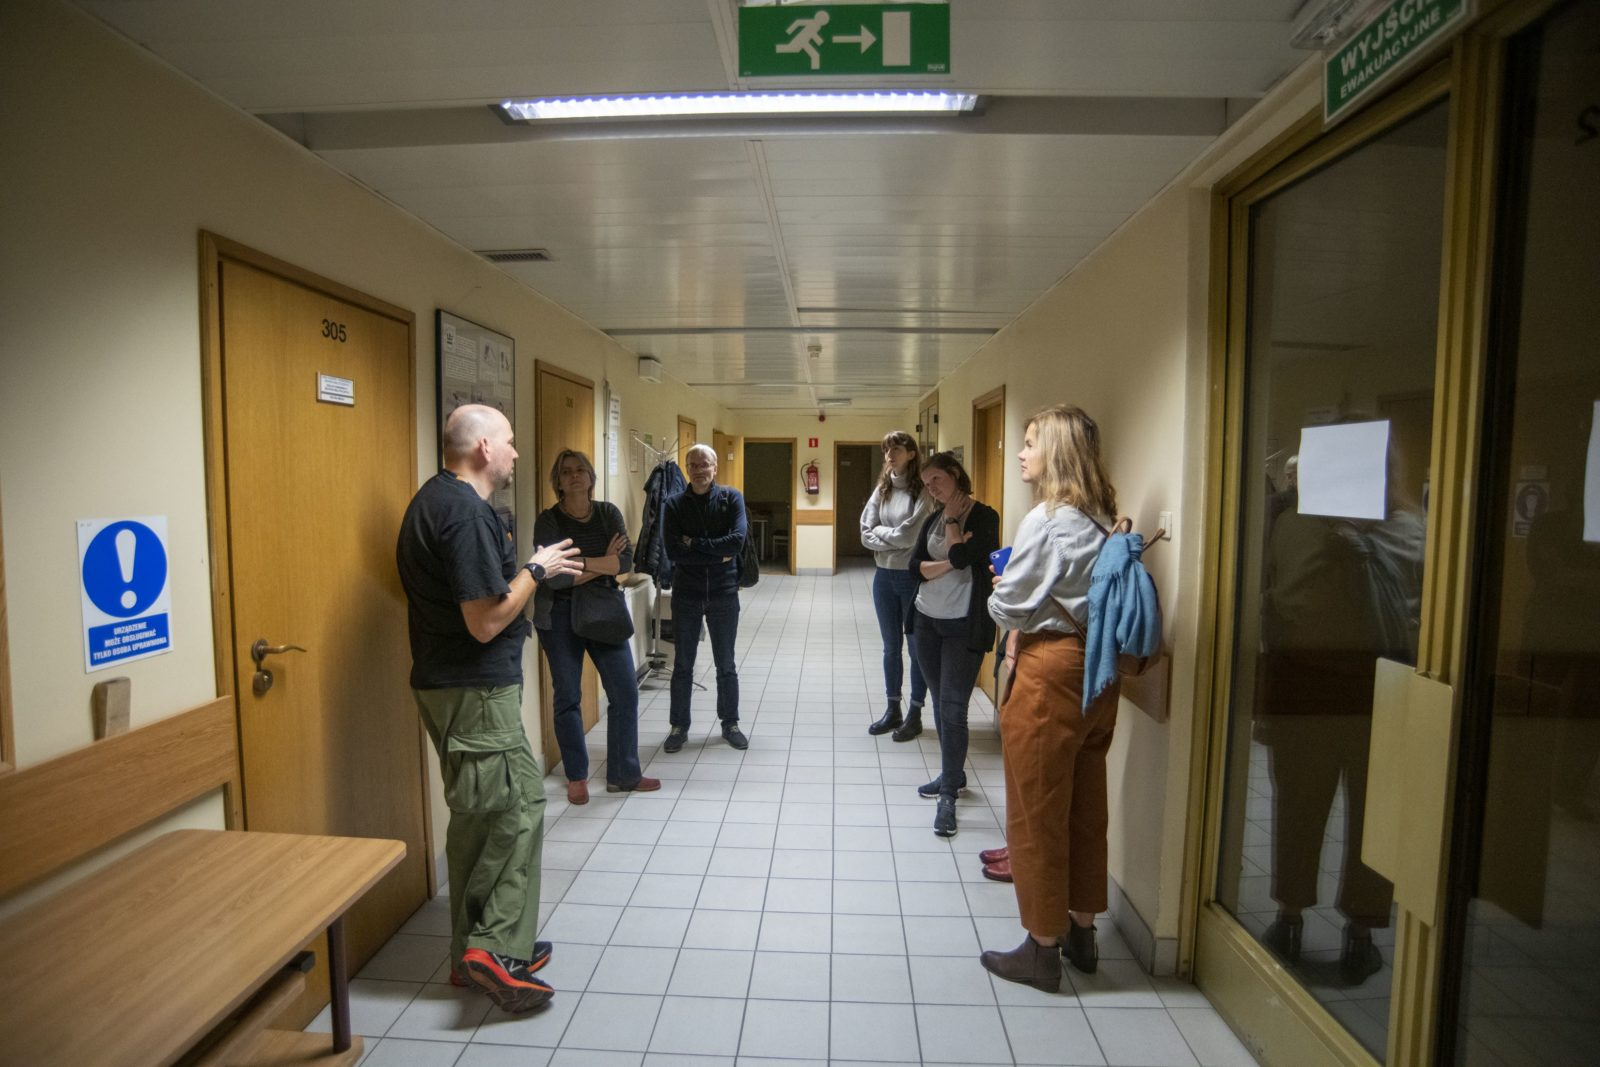 Warschau_2019_Tour_Library_of_Poland_Warsaw_Stasiuk_Konrad_193